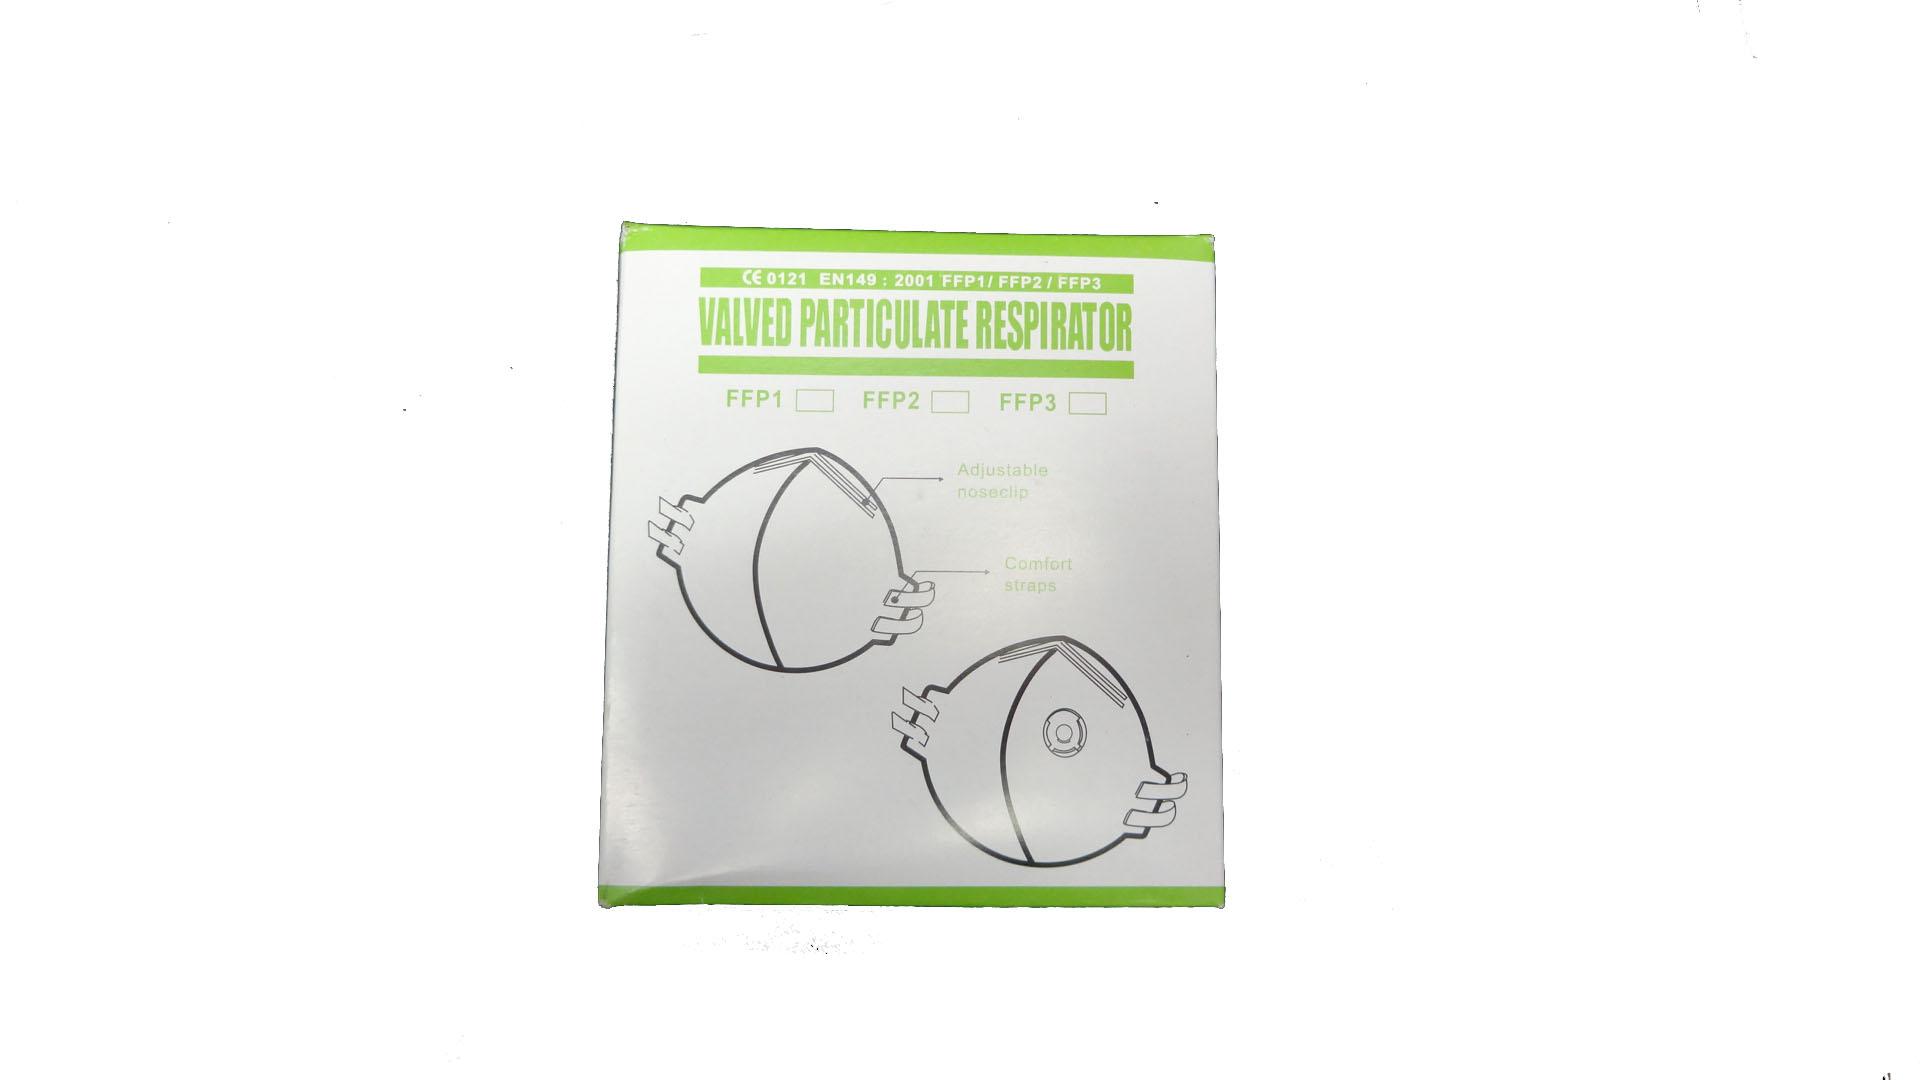 walved particulate respirator